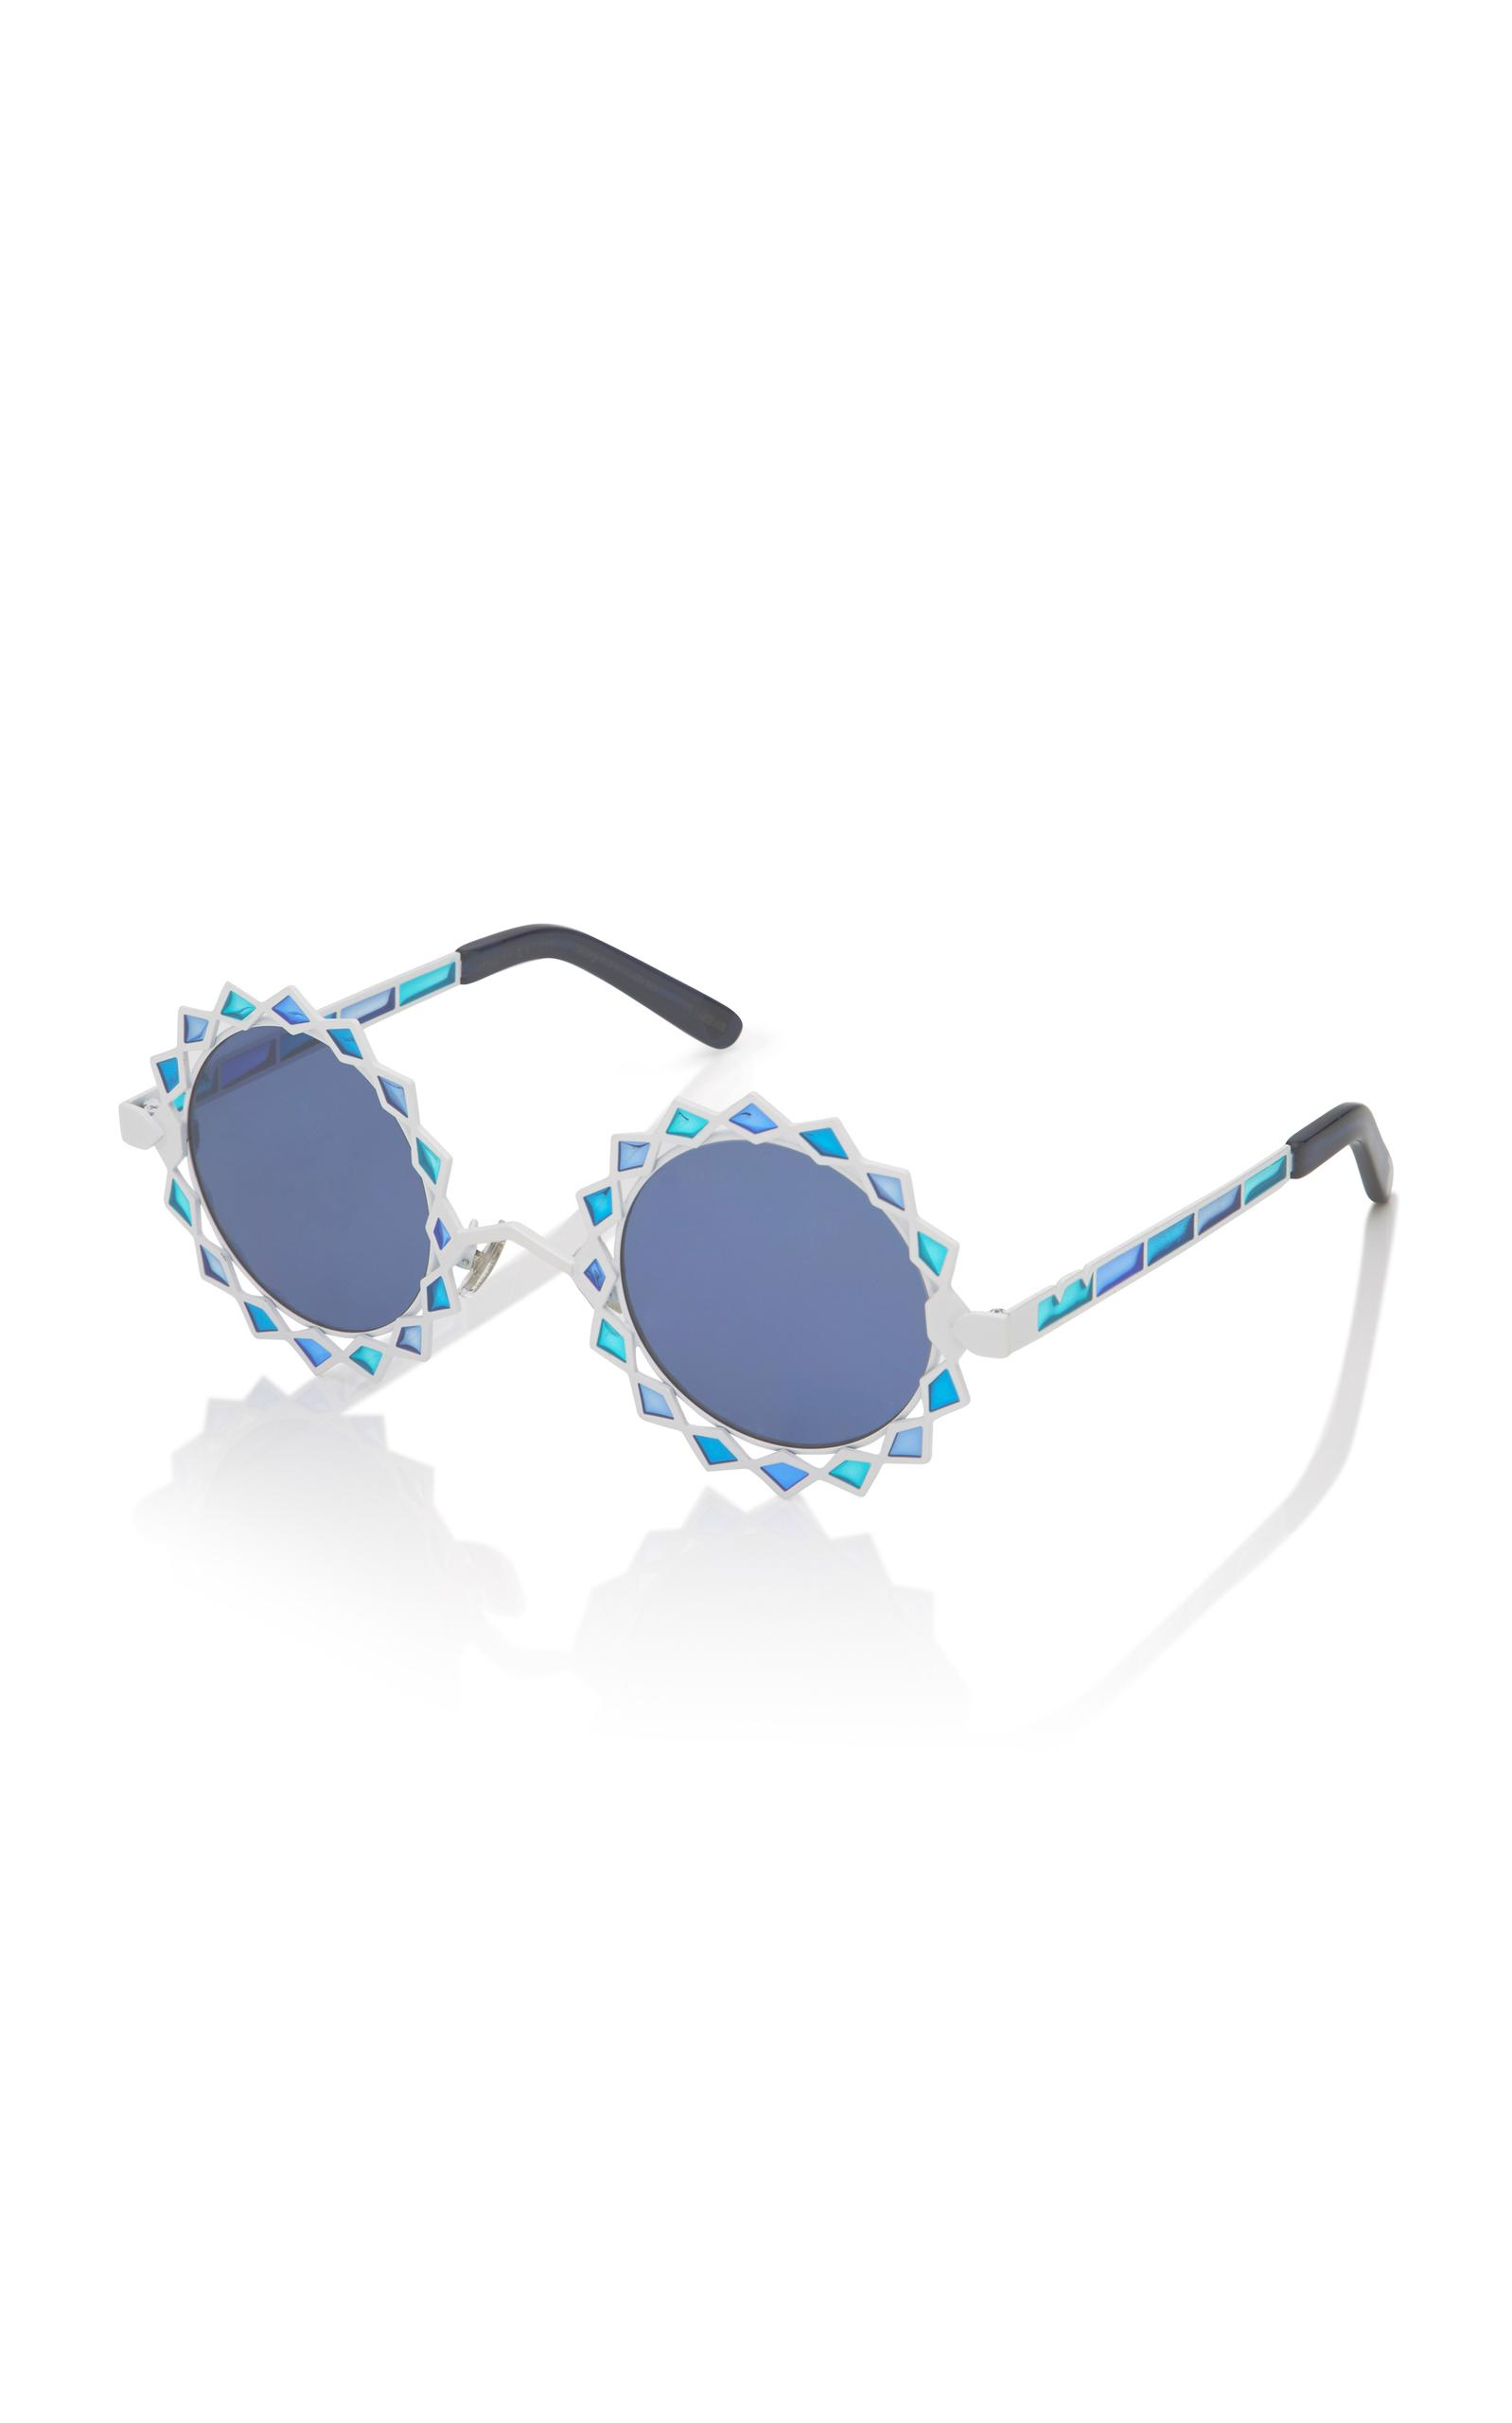 Blue Moon Glasses Frames - Glass Designs